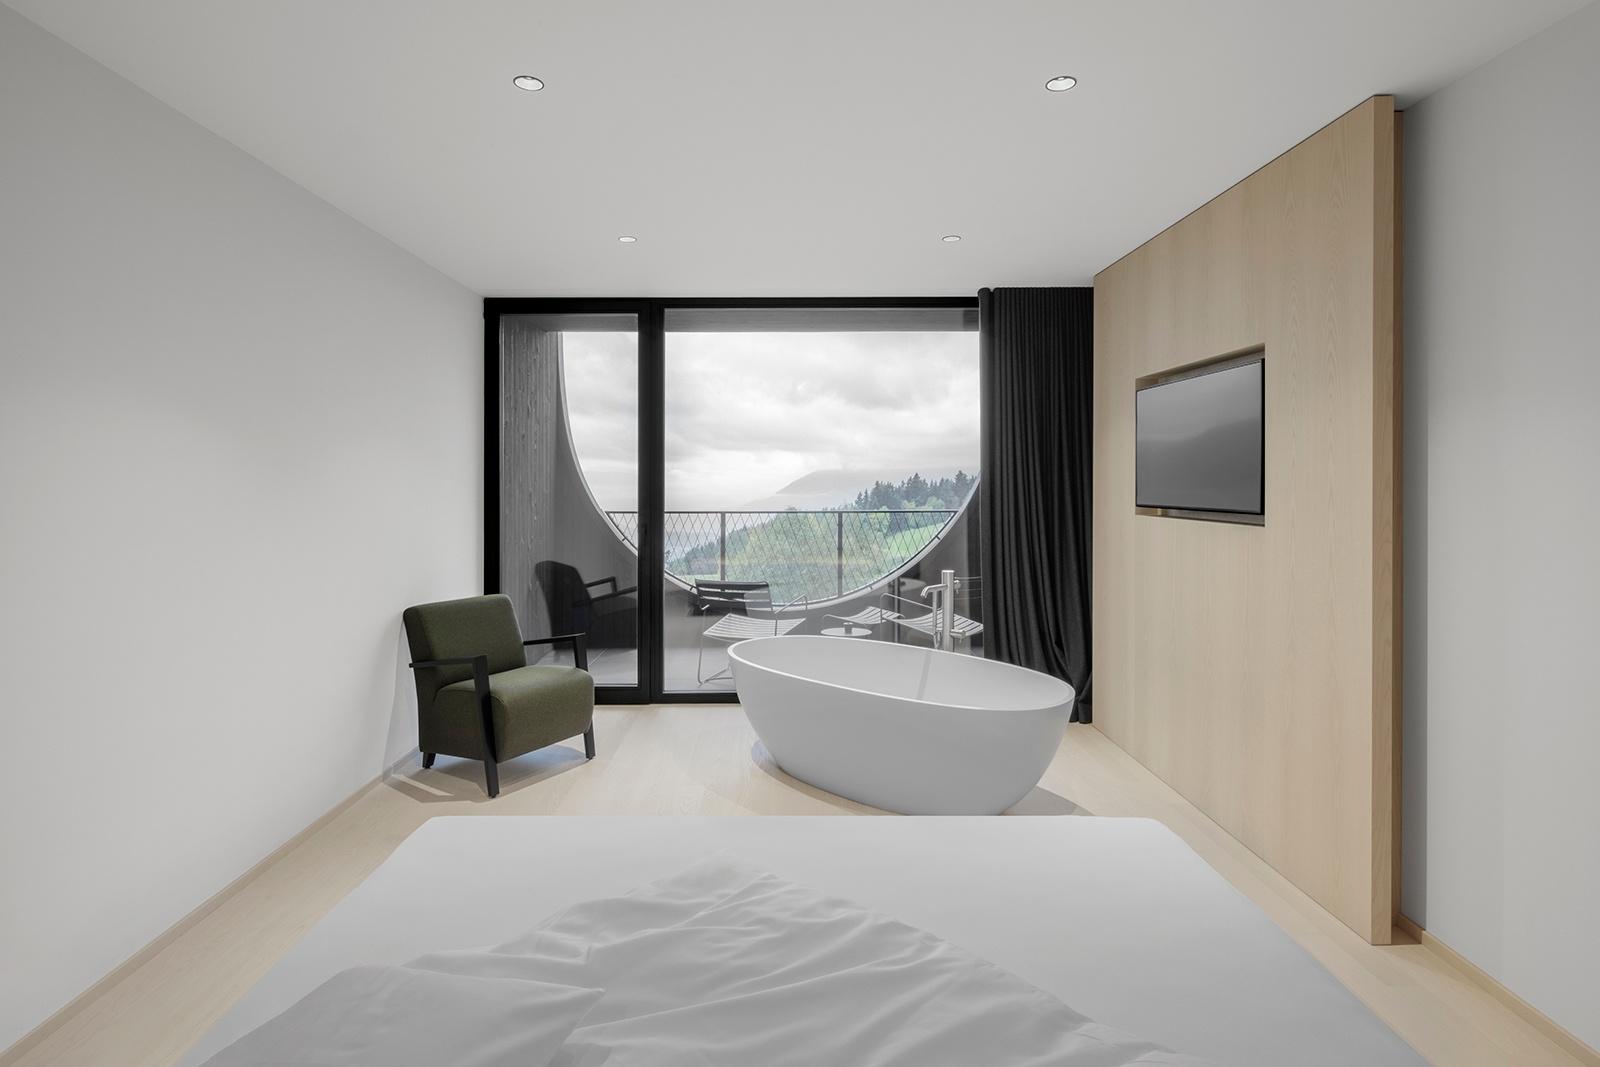 14_Peter_Pichler_Architecture_Hotel_Milla_Montis